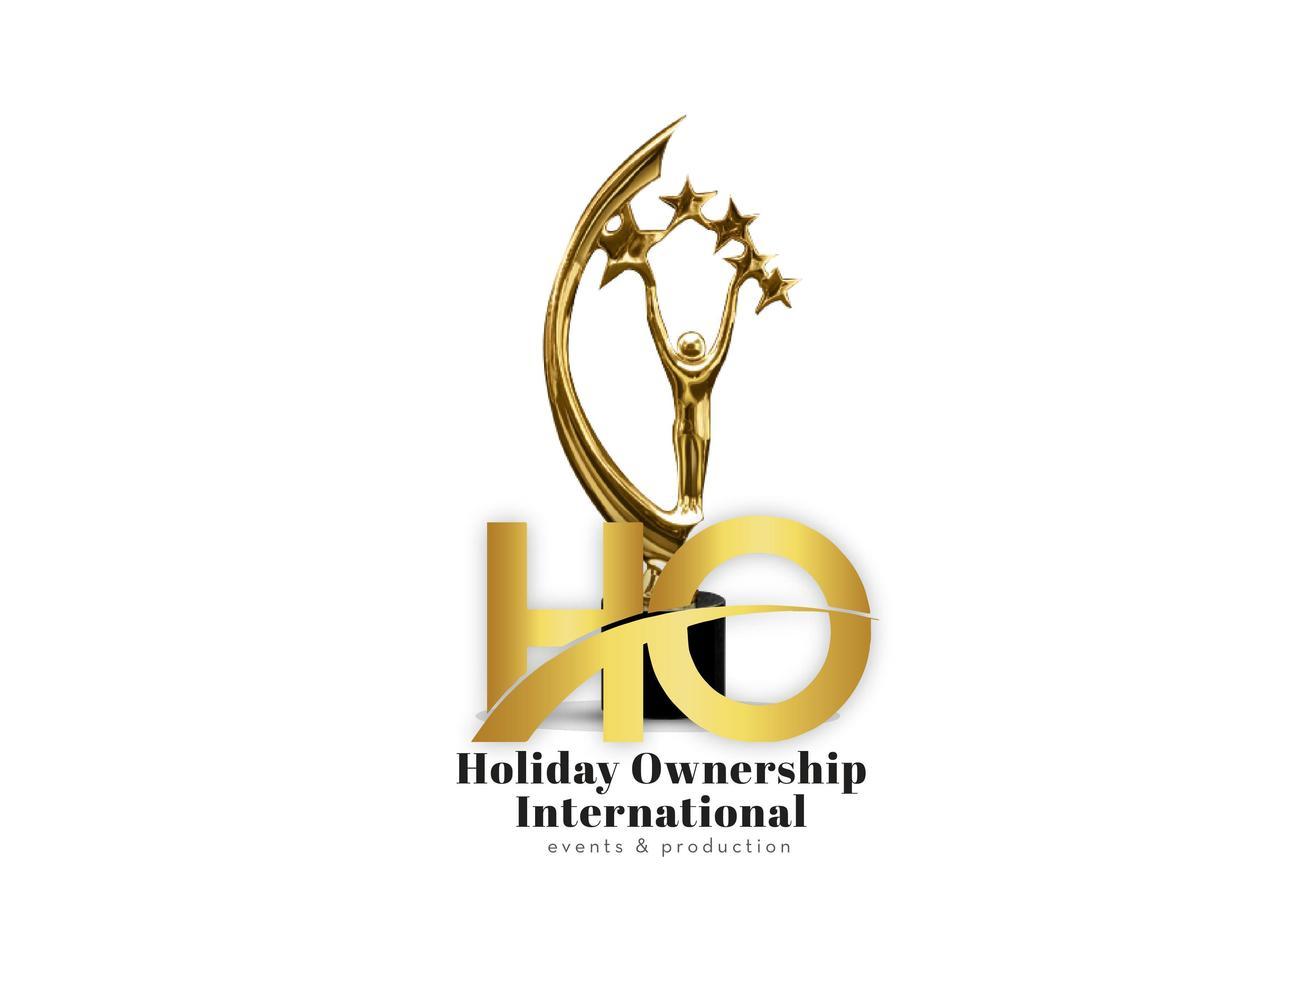 هوليداي اونر شيب انترناشيونال – Holiday Ownership International